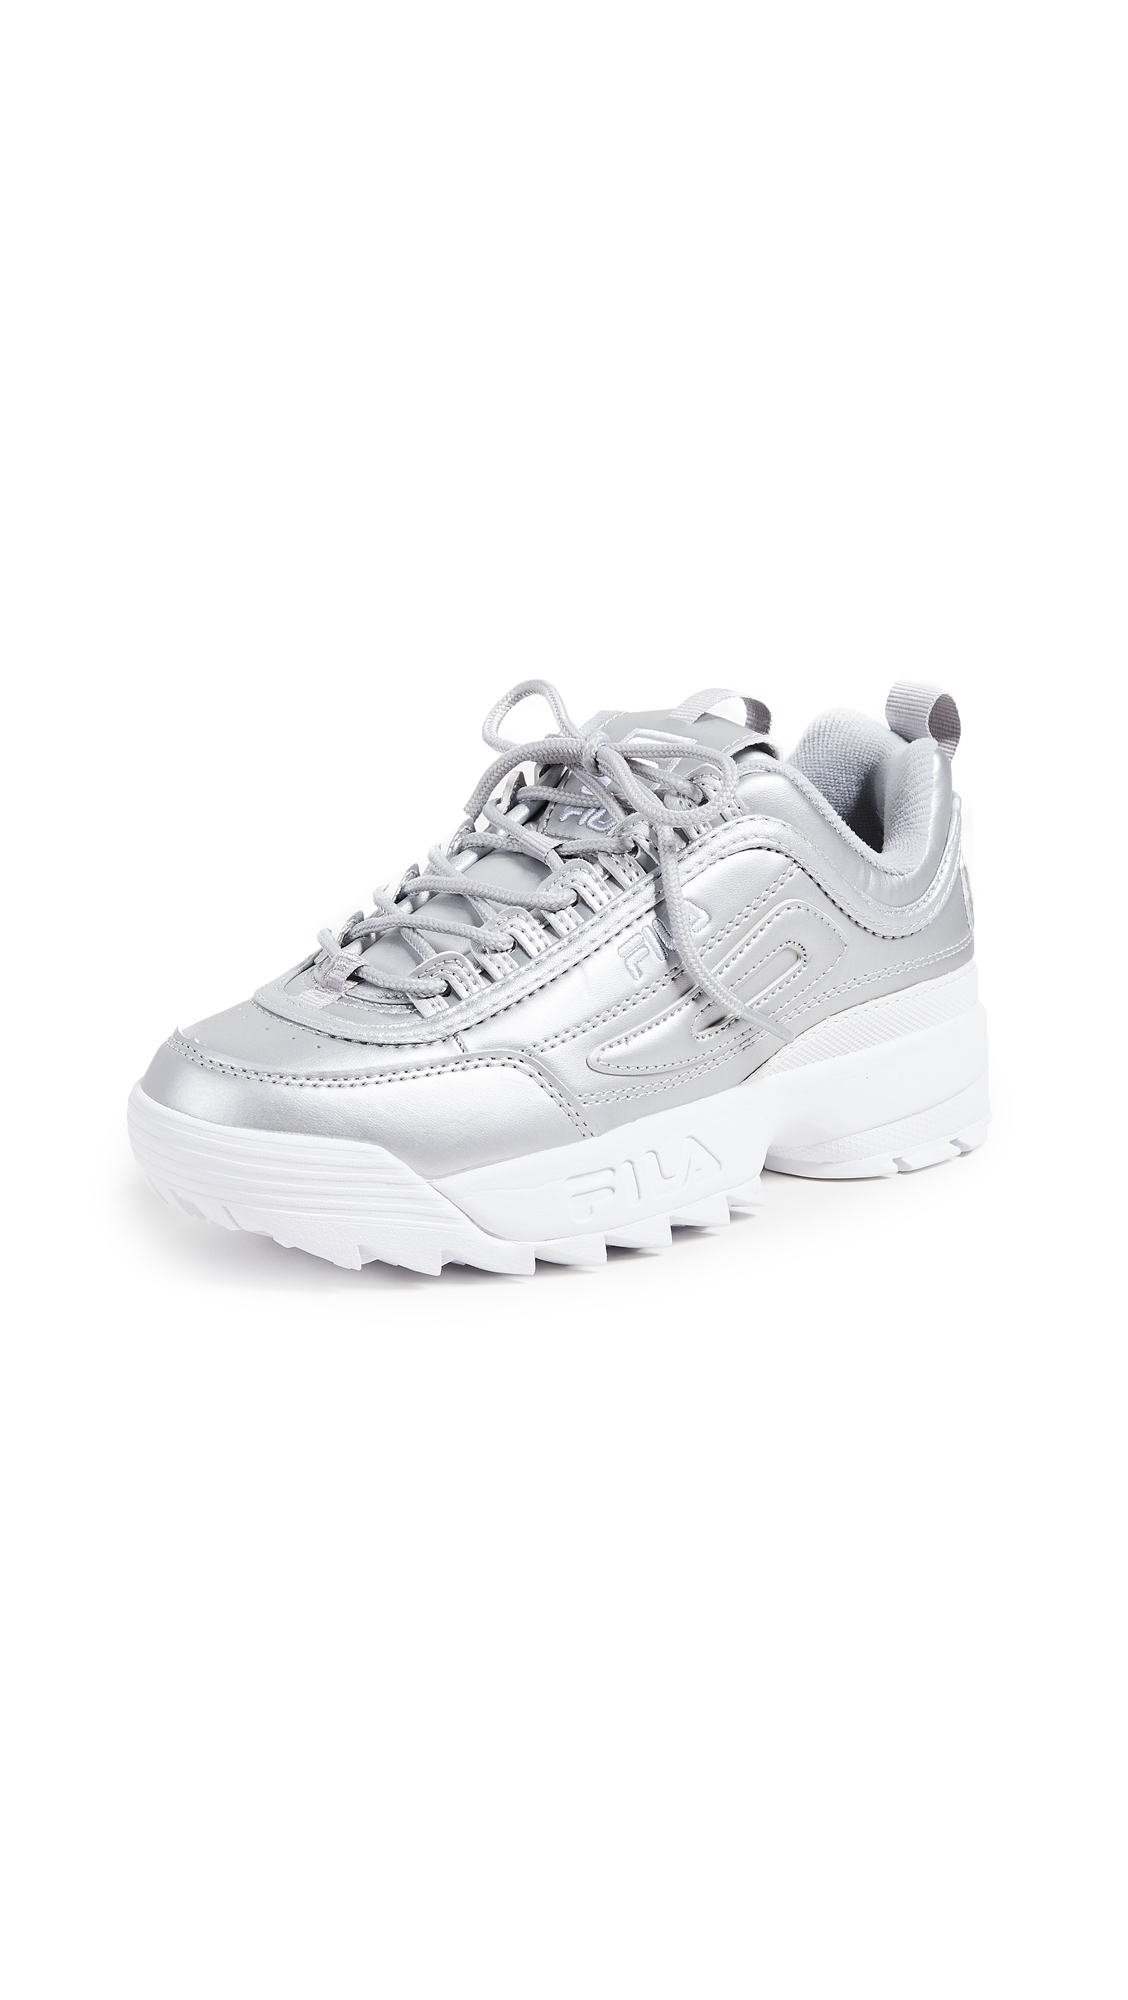 Women'S Disruptor Ii Premium Metallic Casual Shoes, Grey in Metallic Silver/White